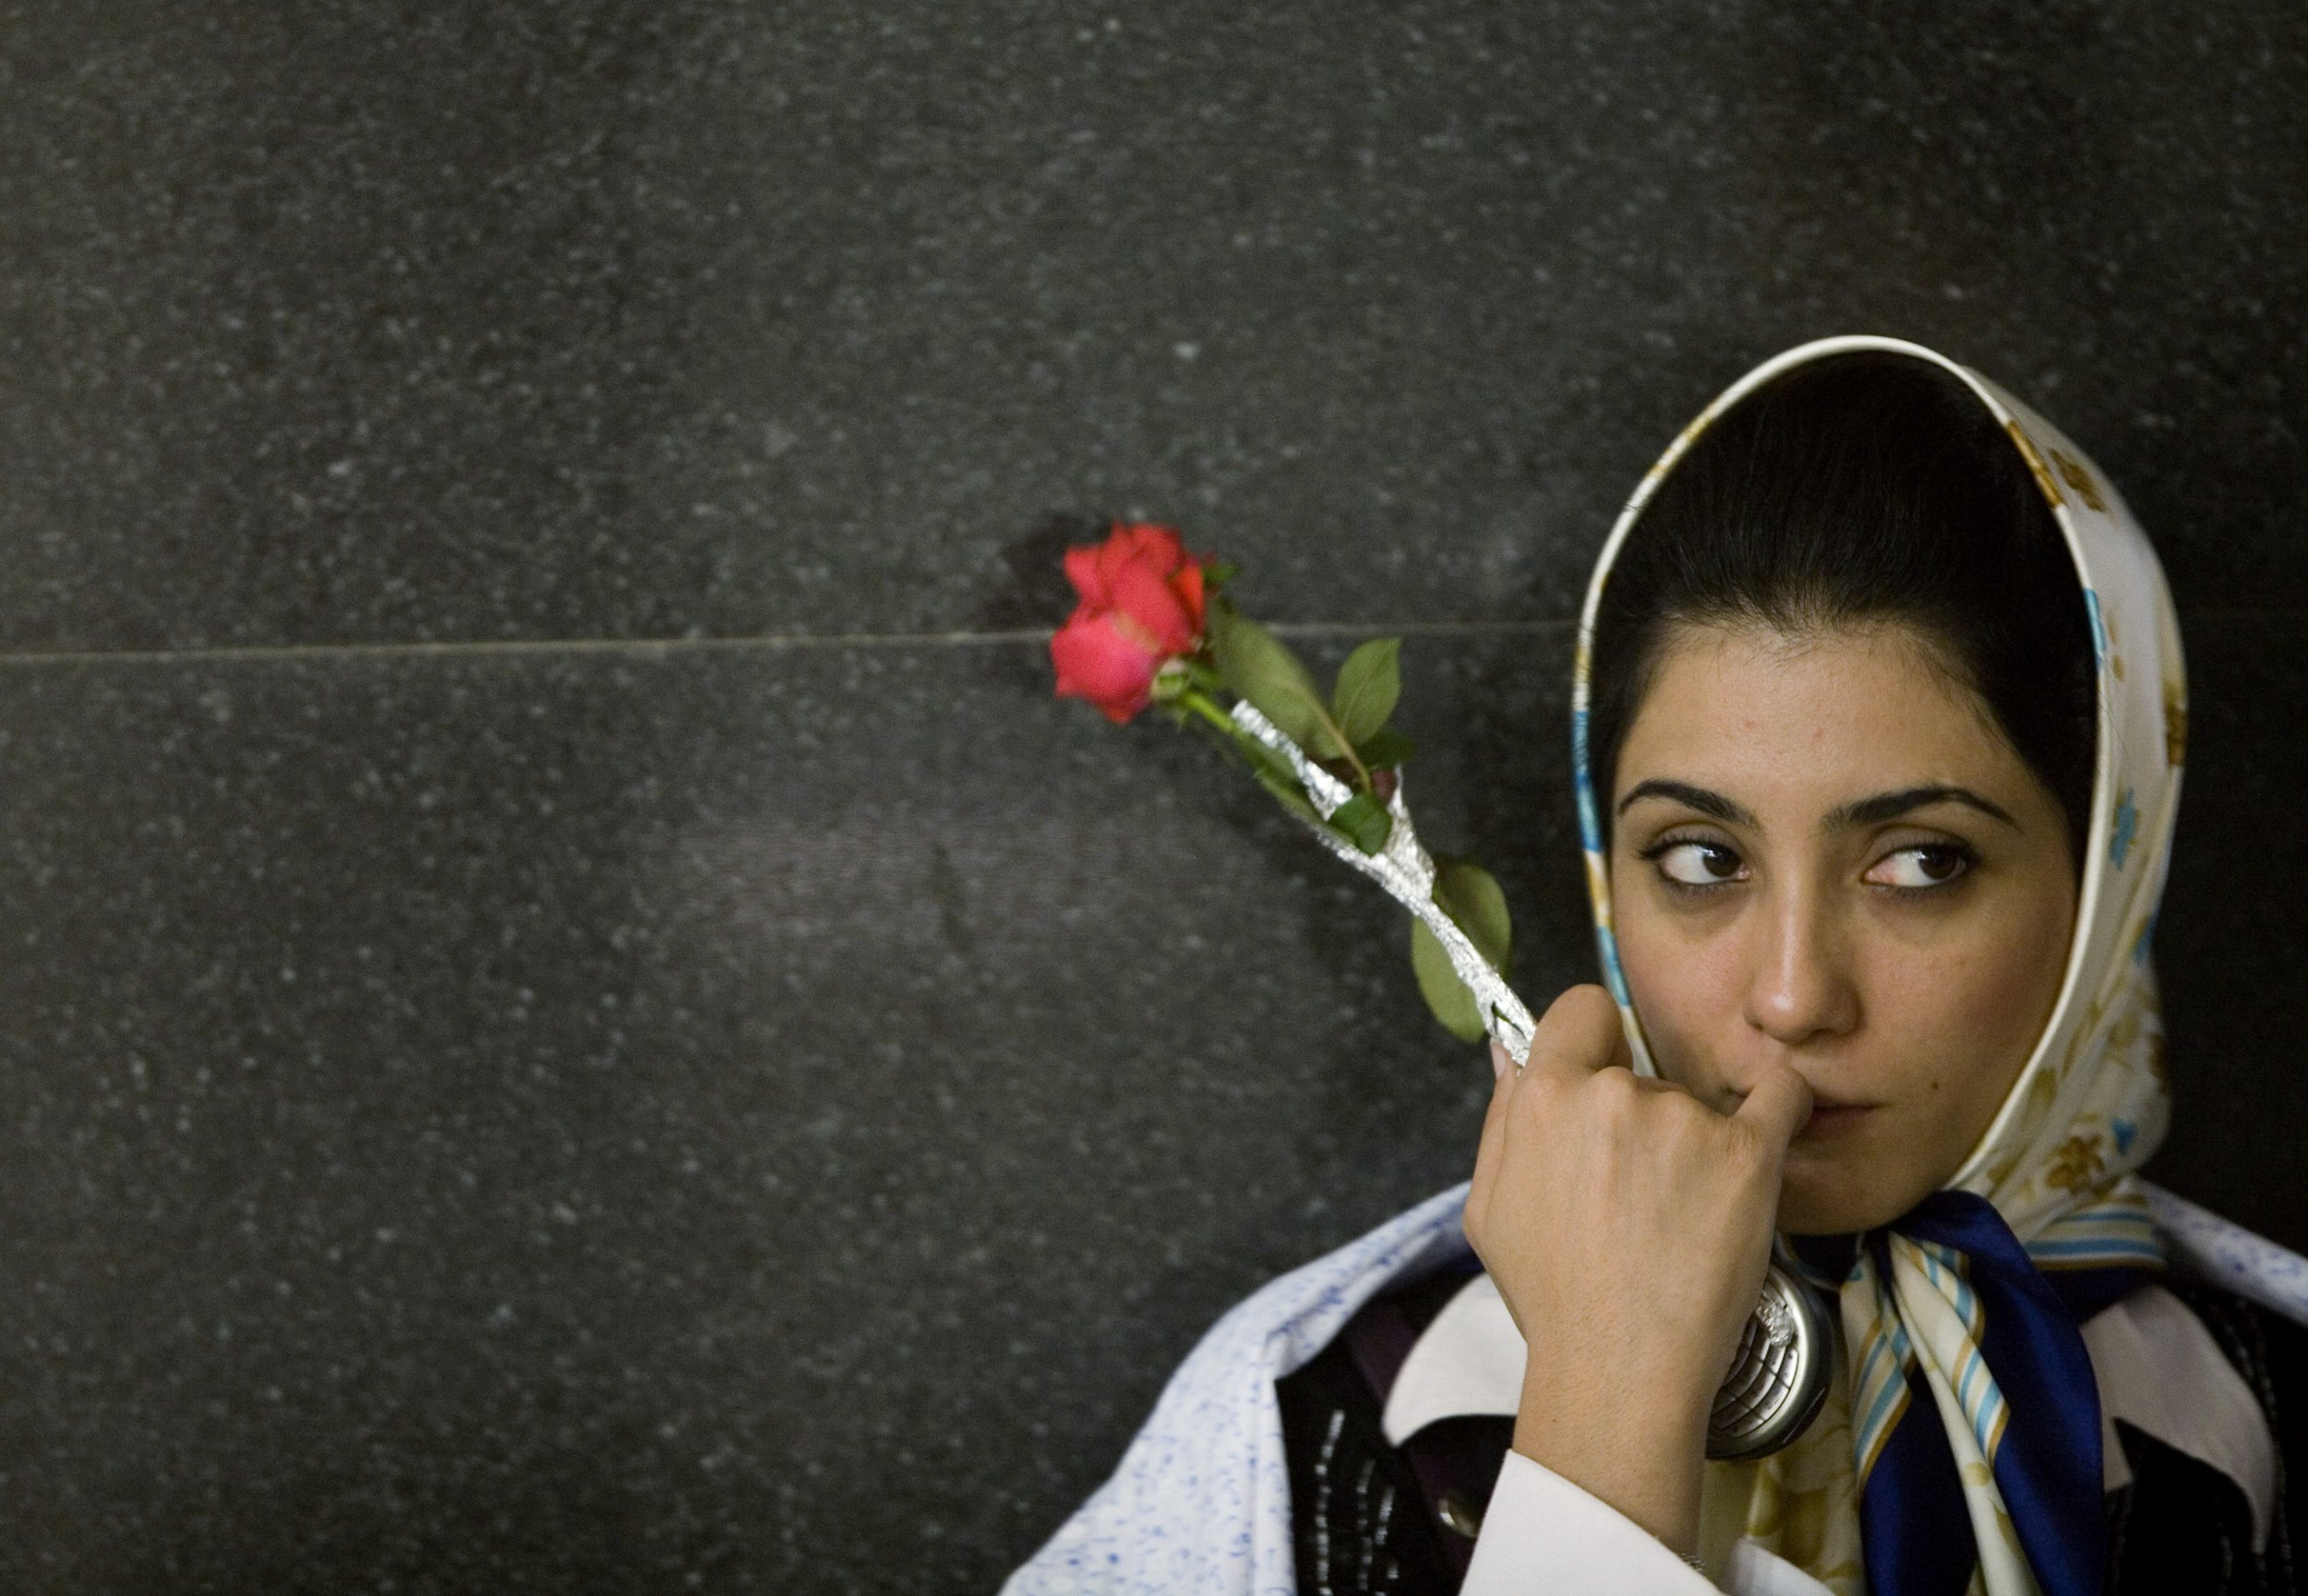 06_25_Iran_Marriage_01